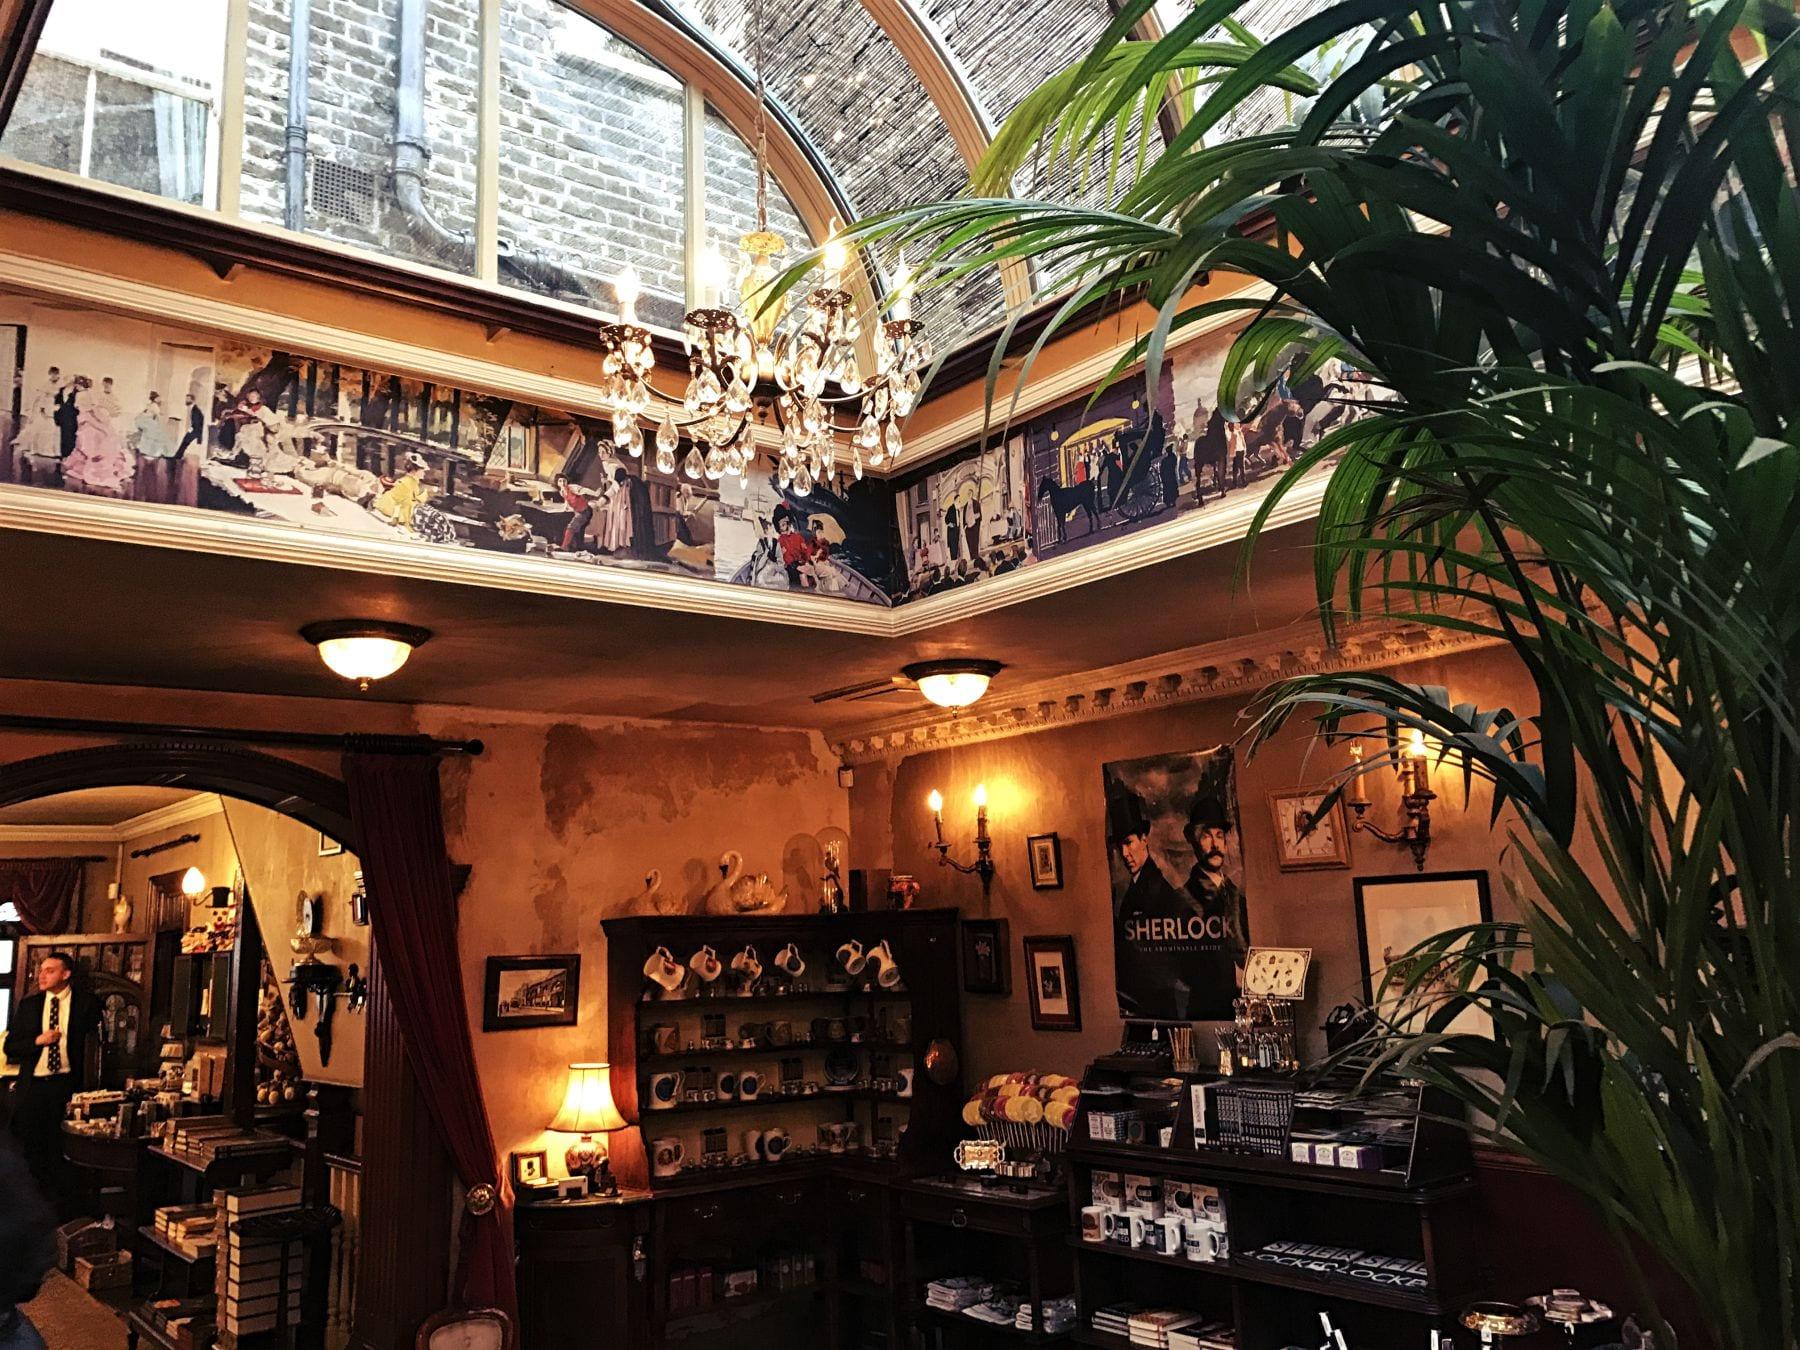 sherlock-holmes-museum-london-shop